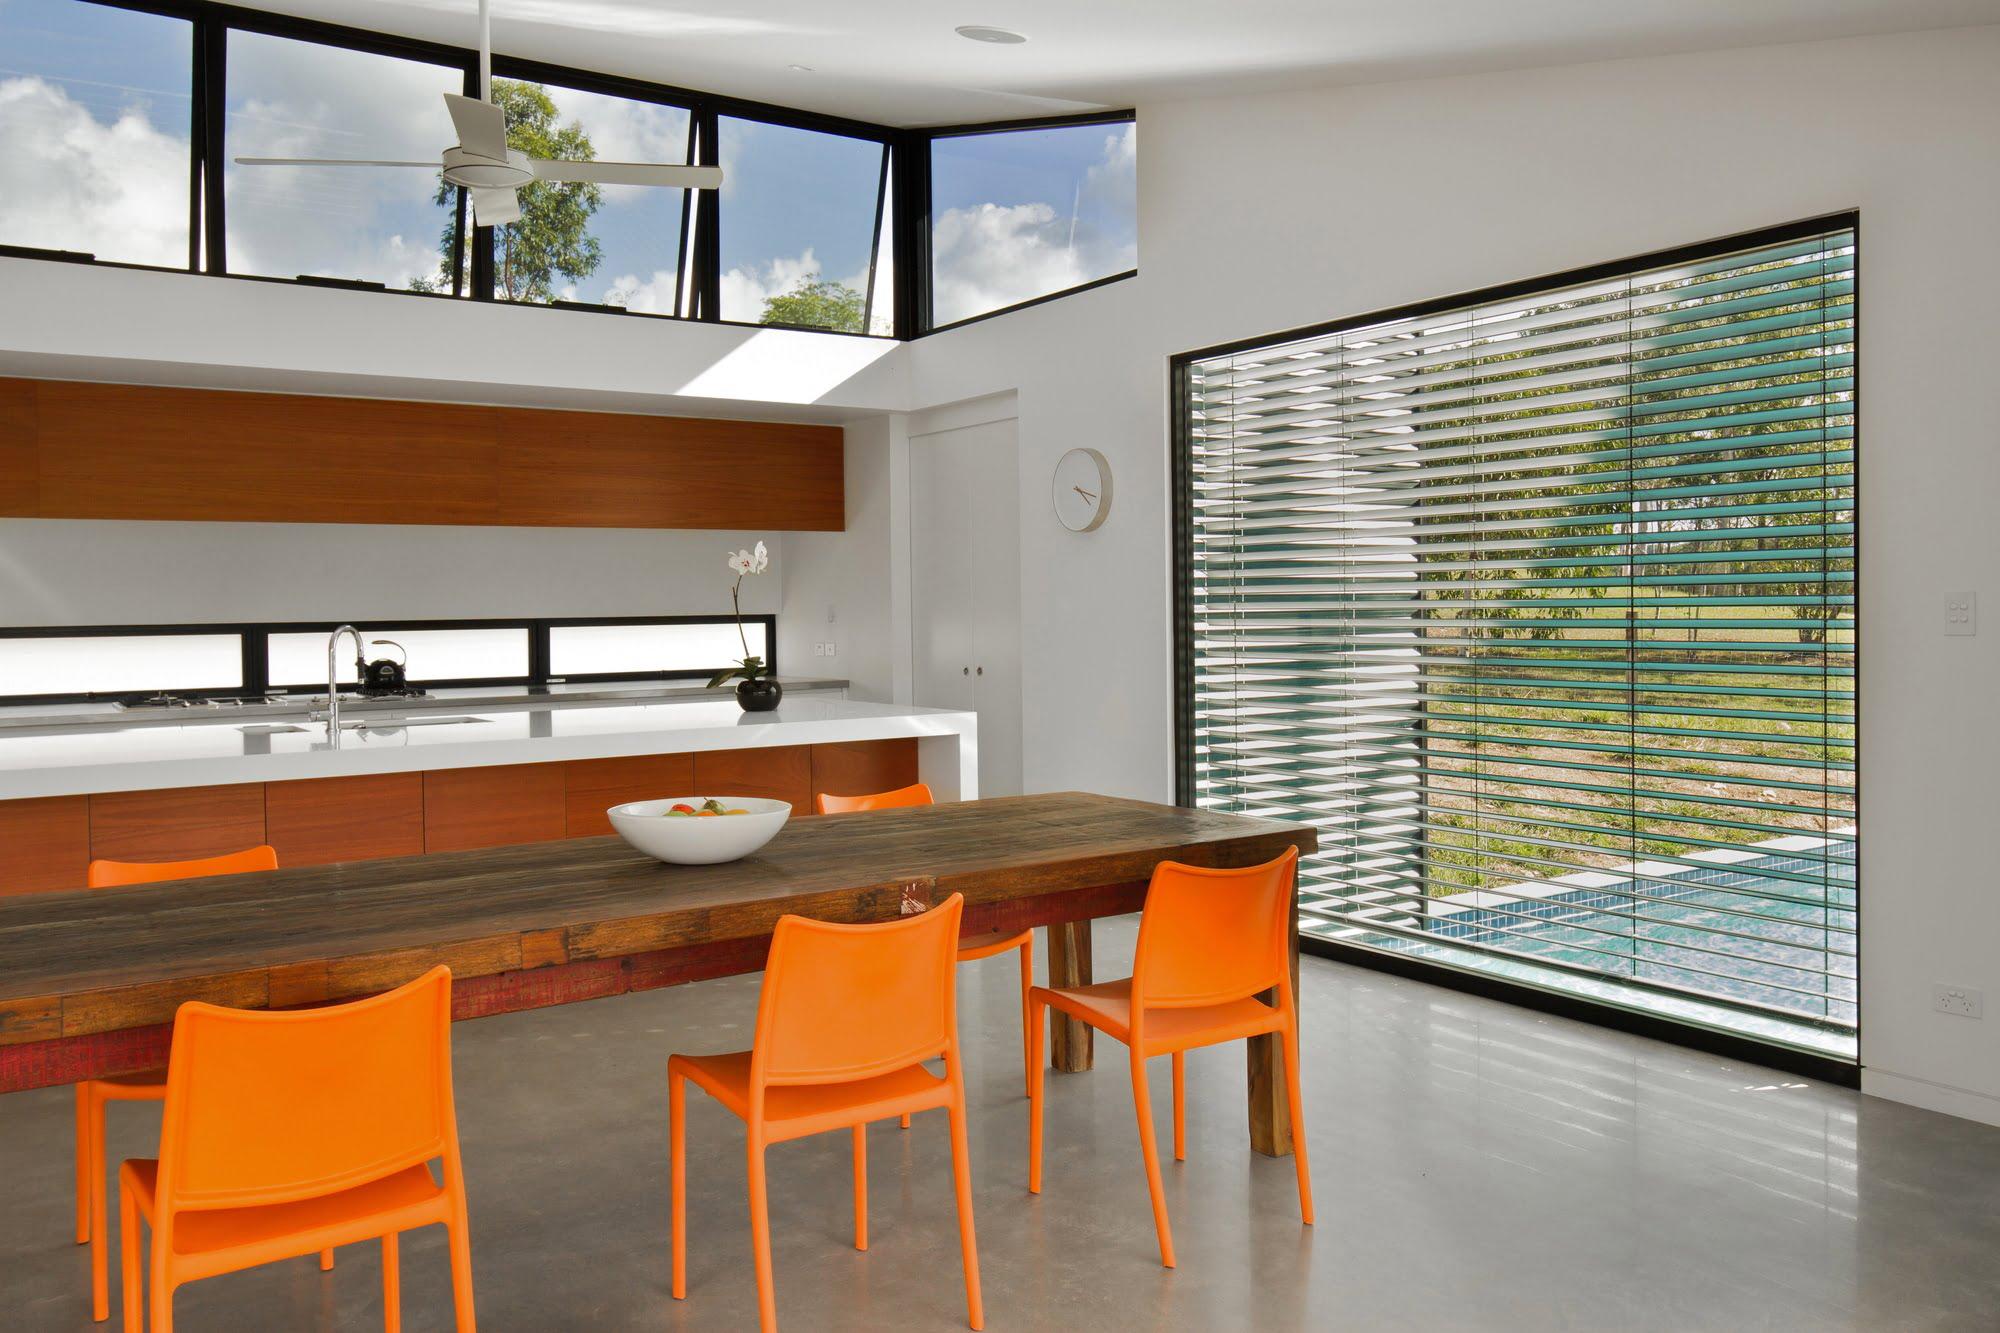 Diseño-de-cocina-comedor-en-casa-angosta - Constructora Paramount